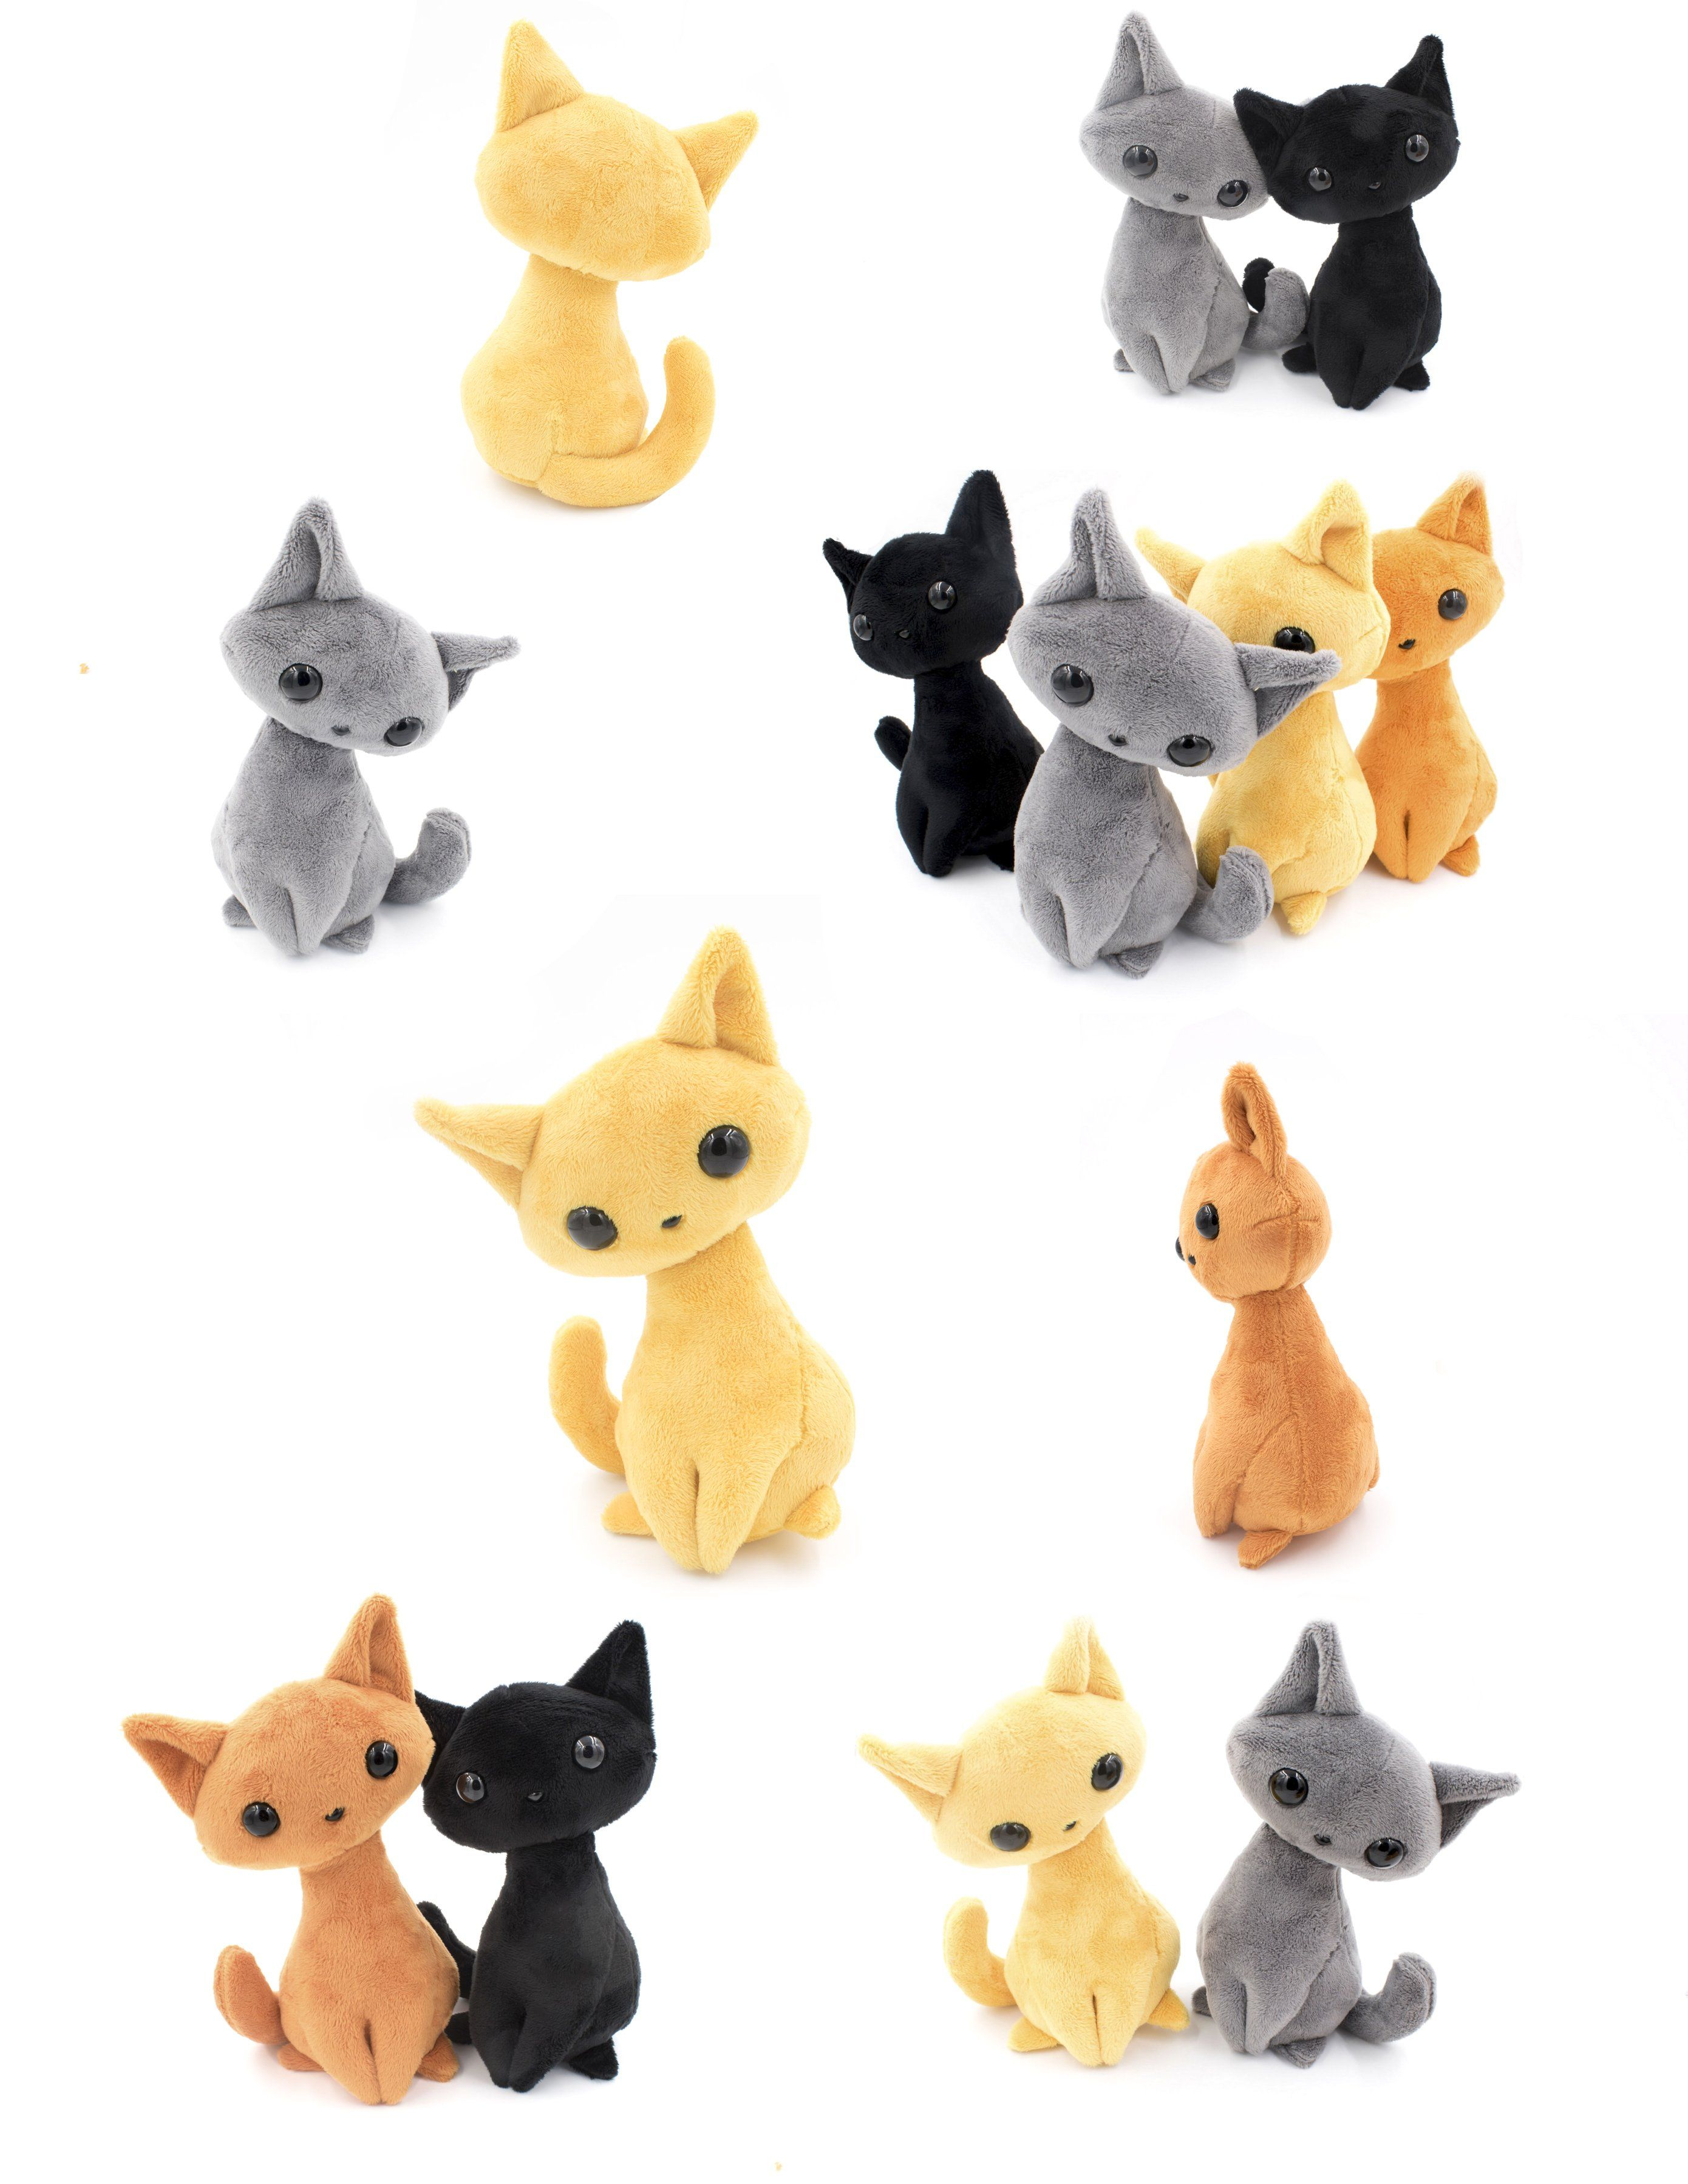 MAKE KIDS STUFFED ANIMAL TOYS SOFT~CLOTH~PLUSH CAT~FOX~BUNNY SEWING PATTERN